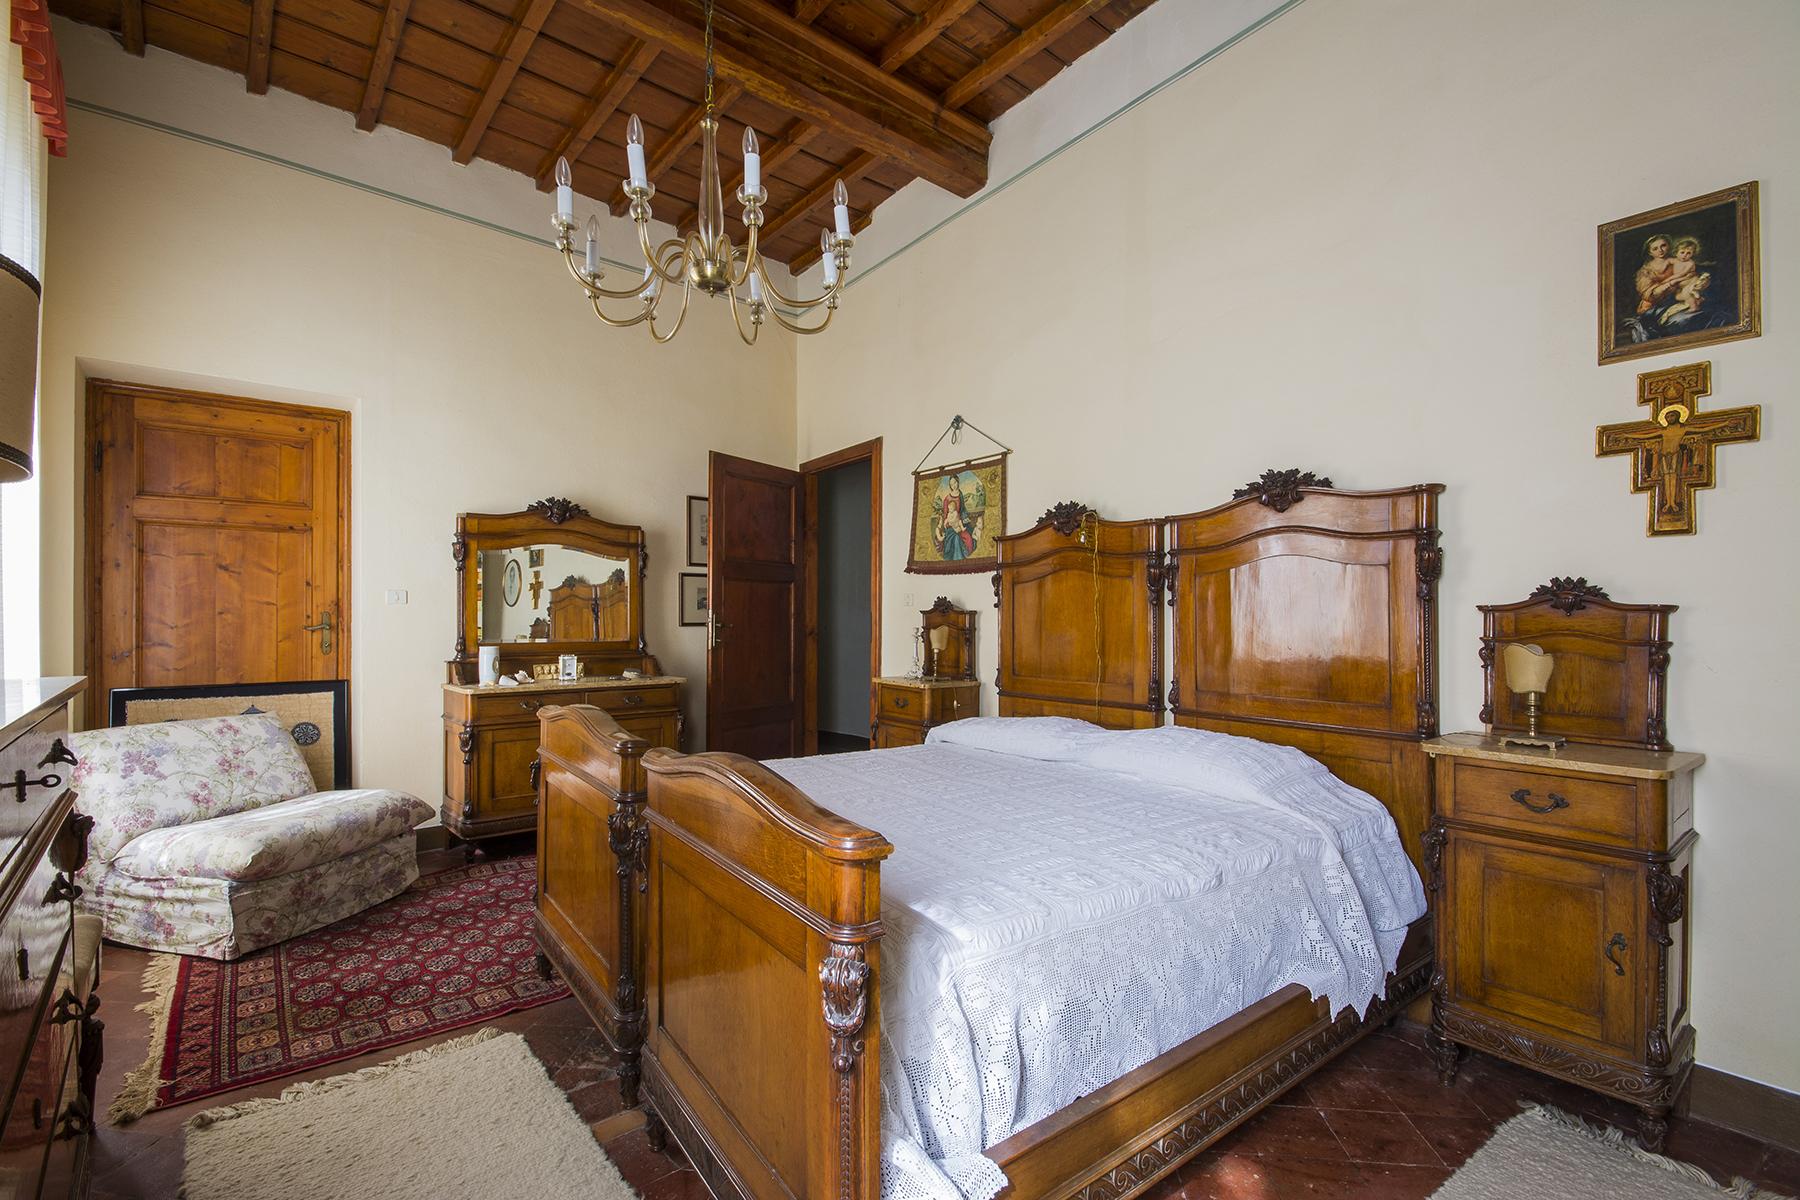 Villa in Vendita a Lucca: 5 locali, 1210 mq - Foto 14